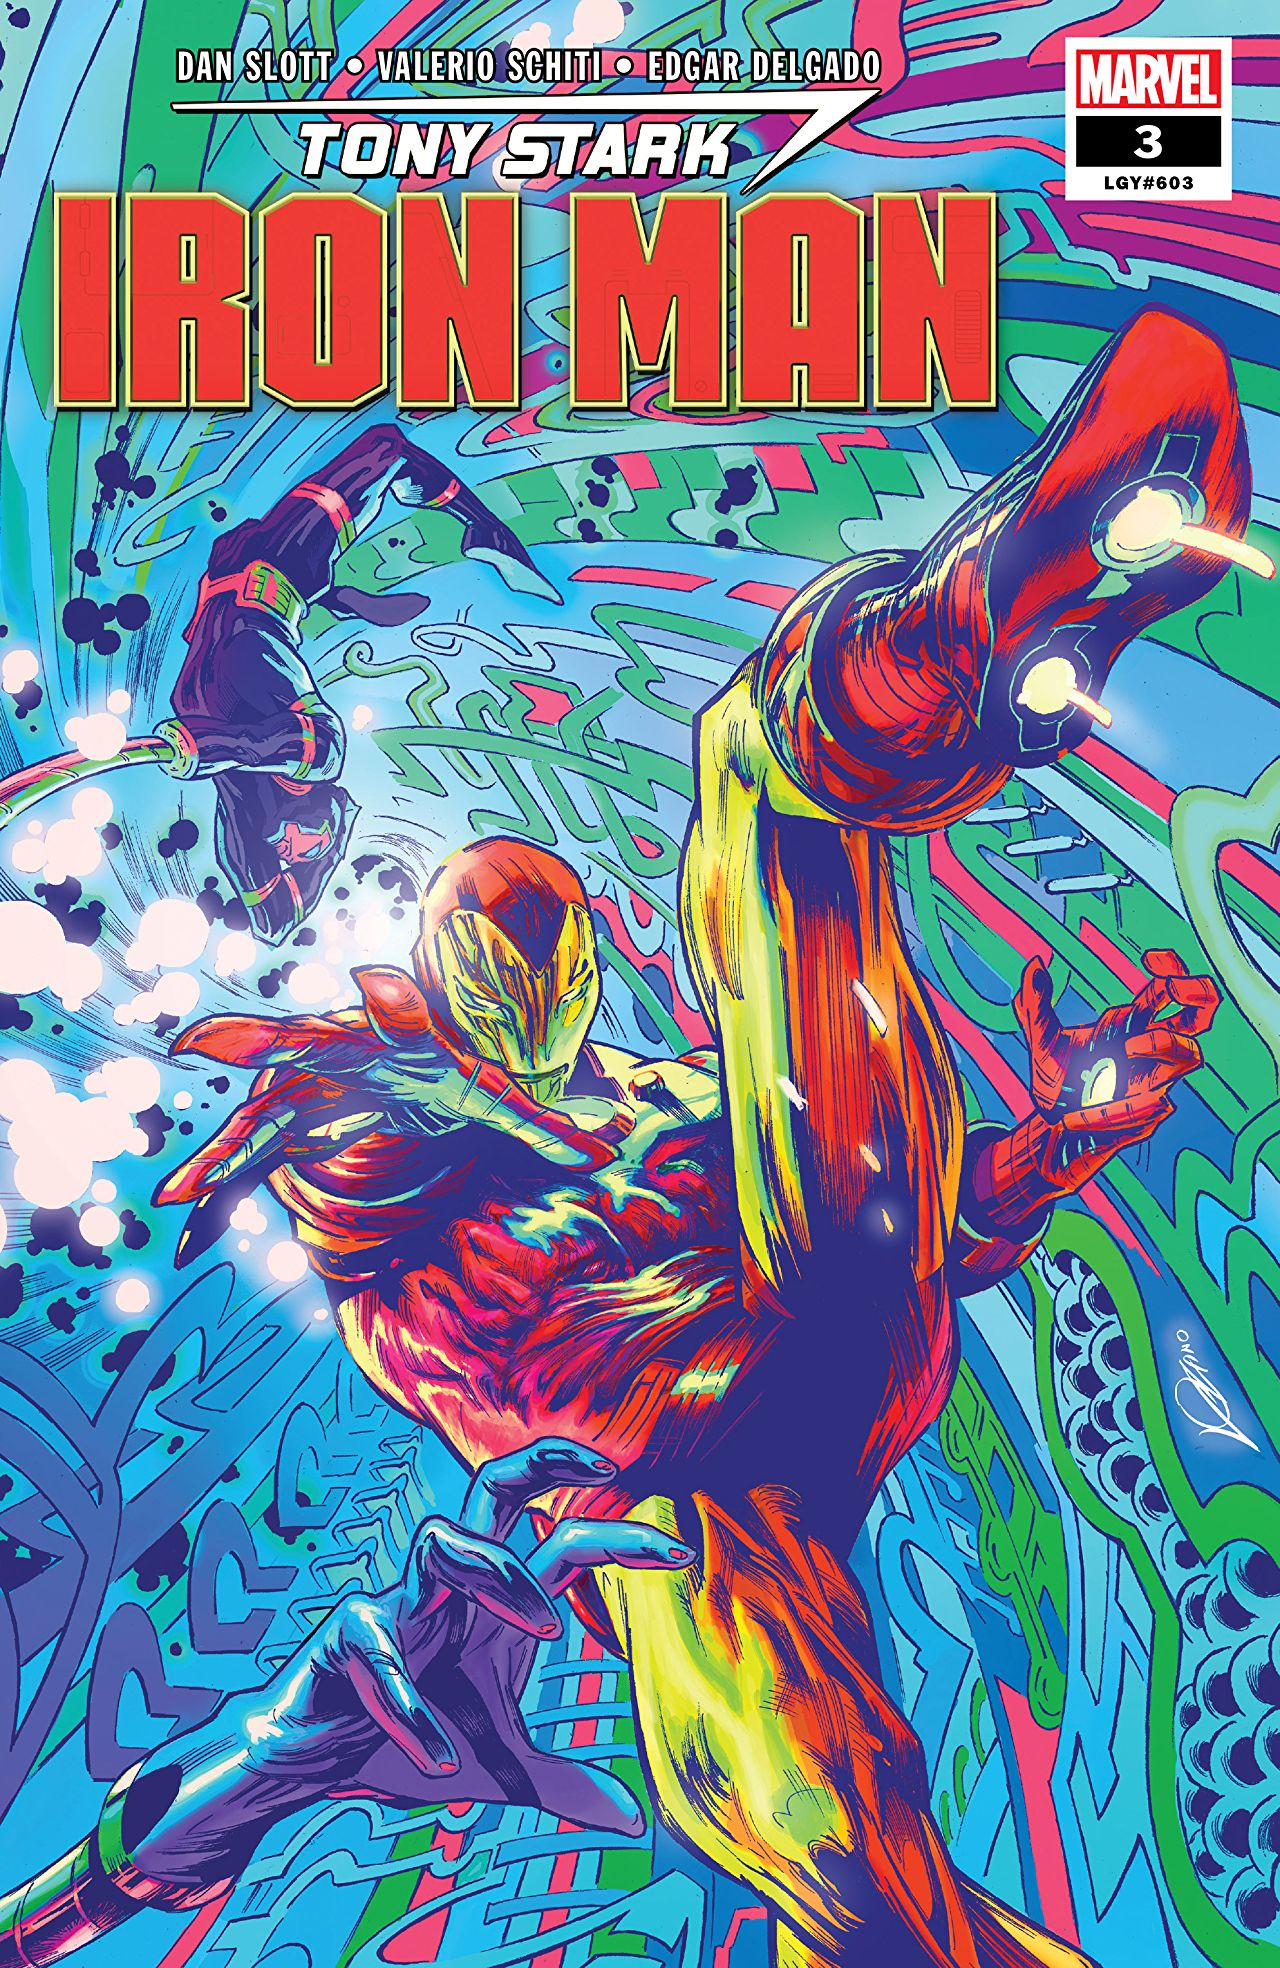 Tony Stark - Iron Man 3